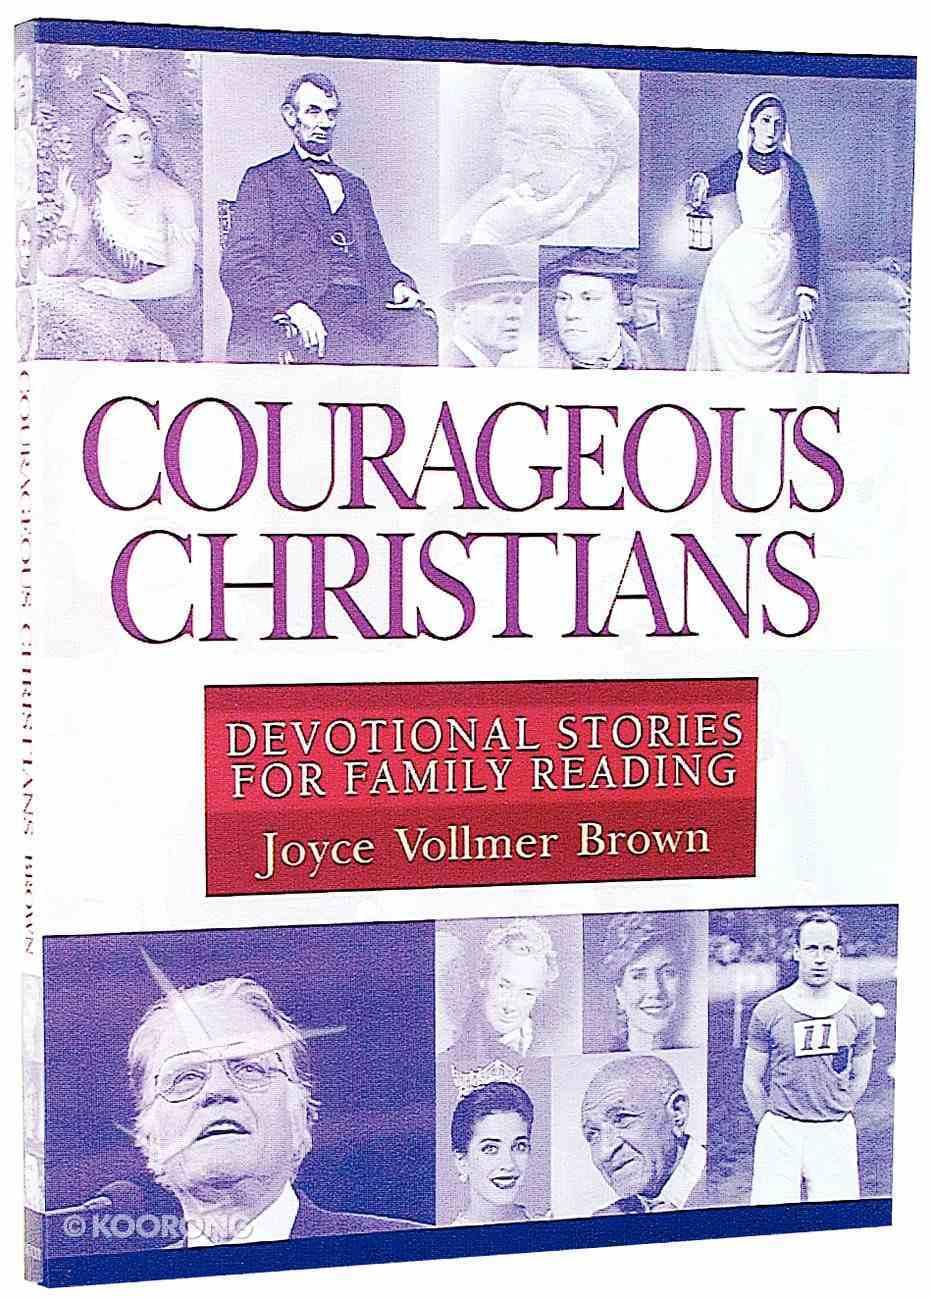 Courageous Christians Paperback